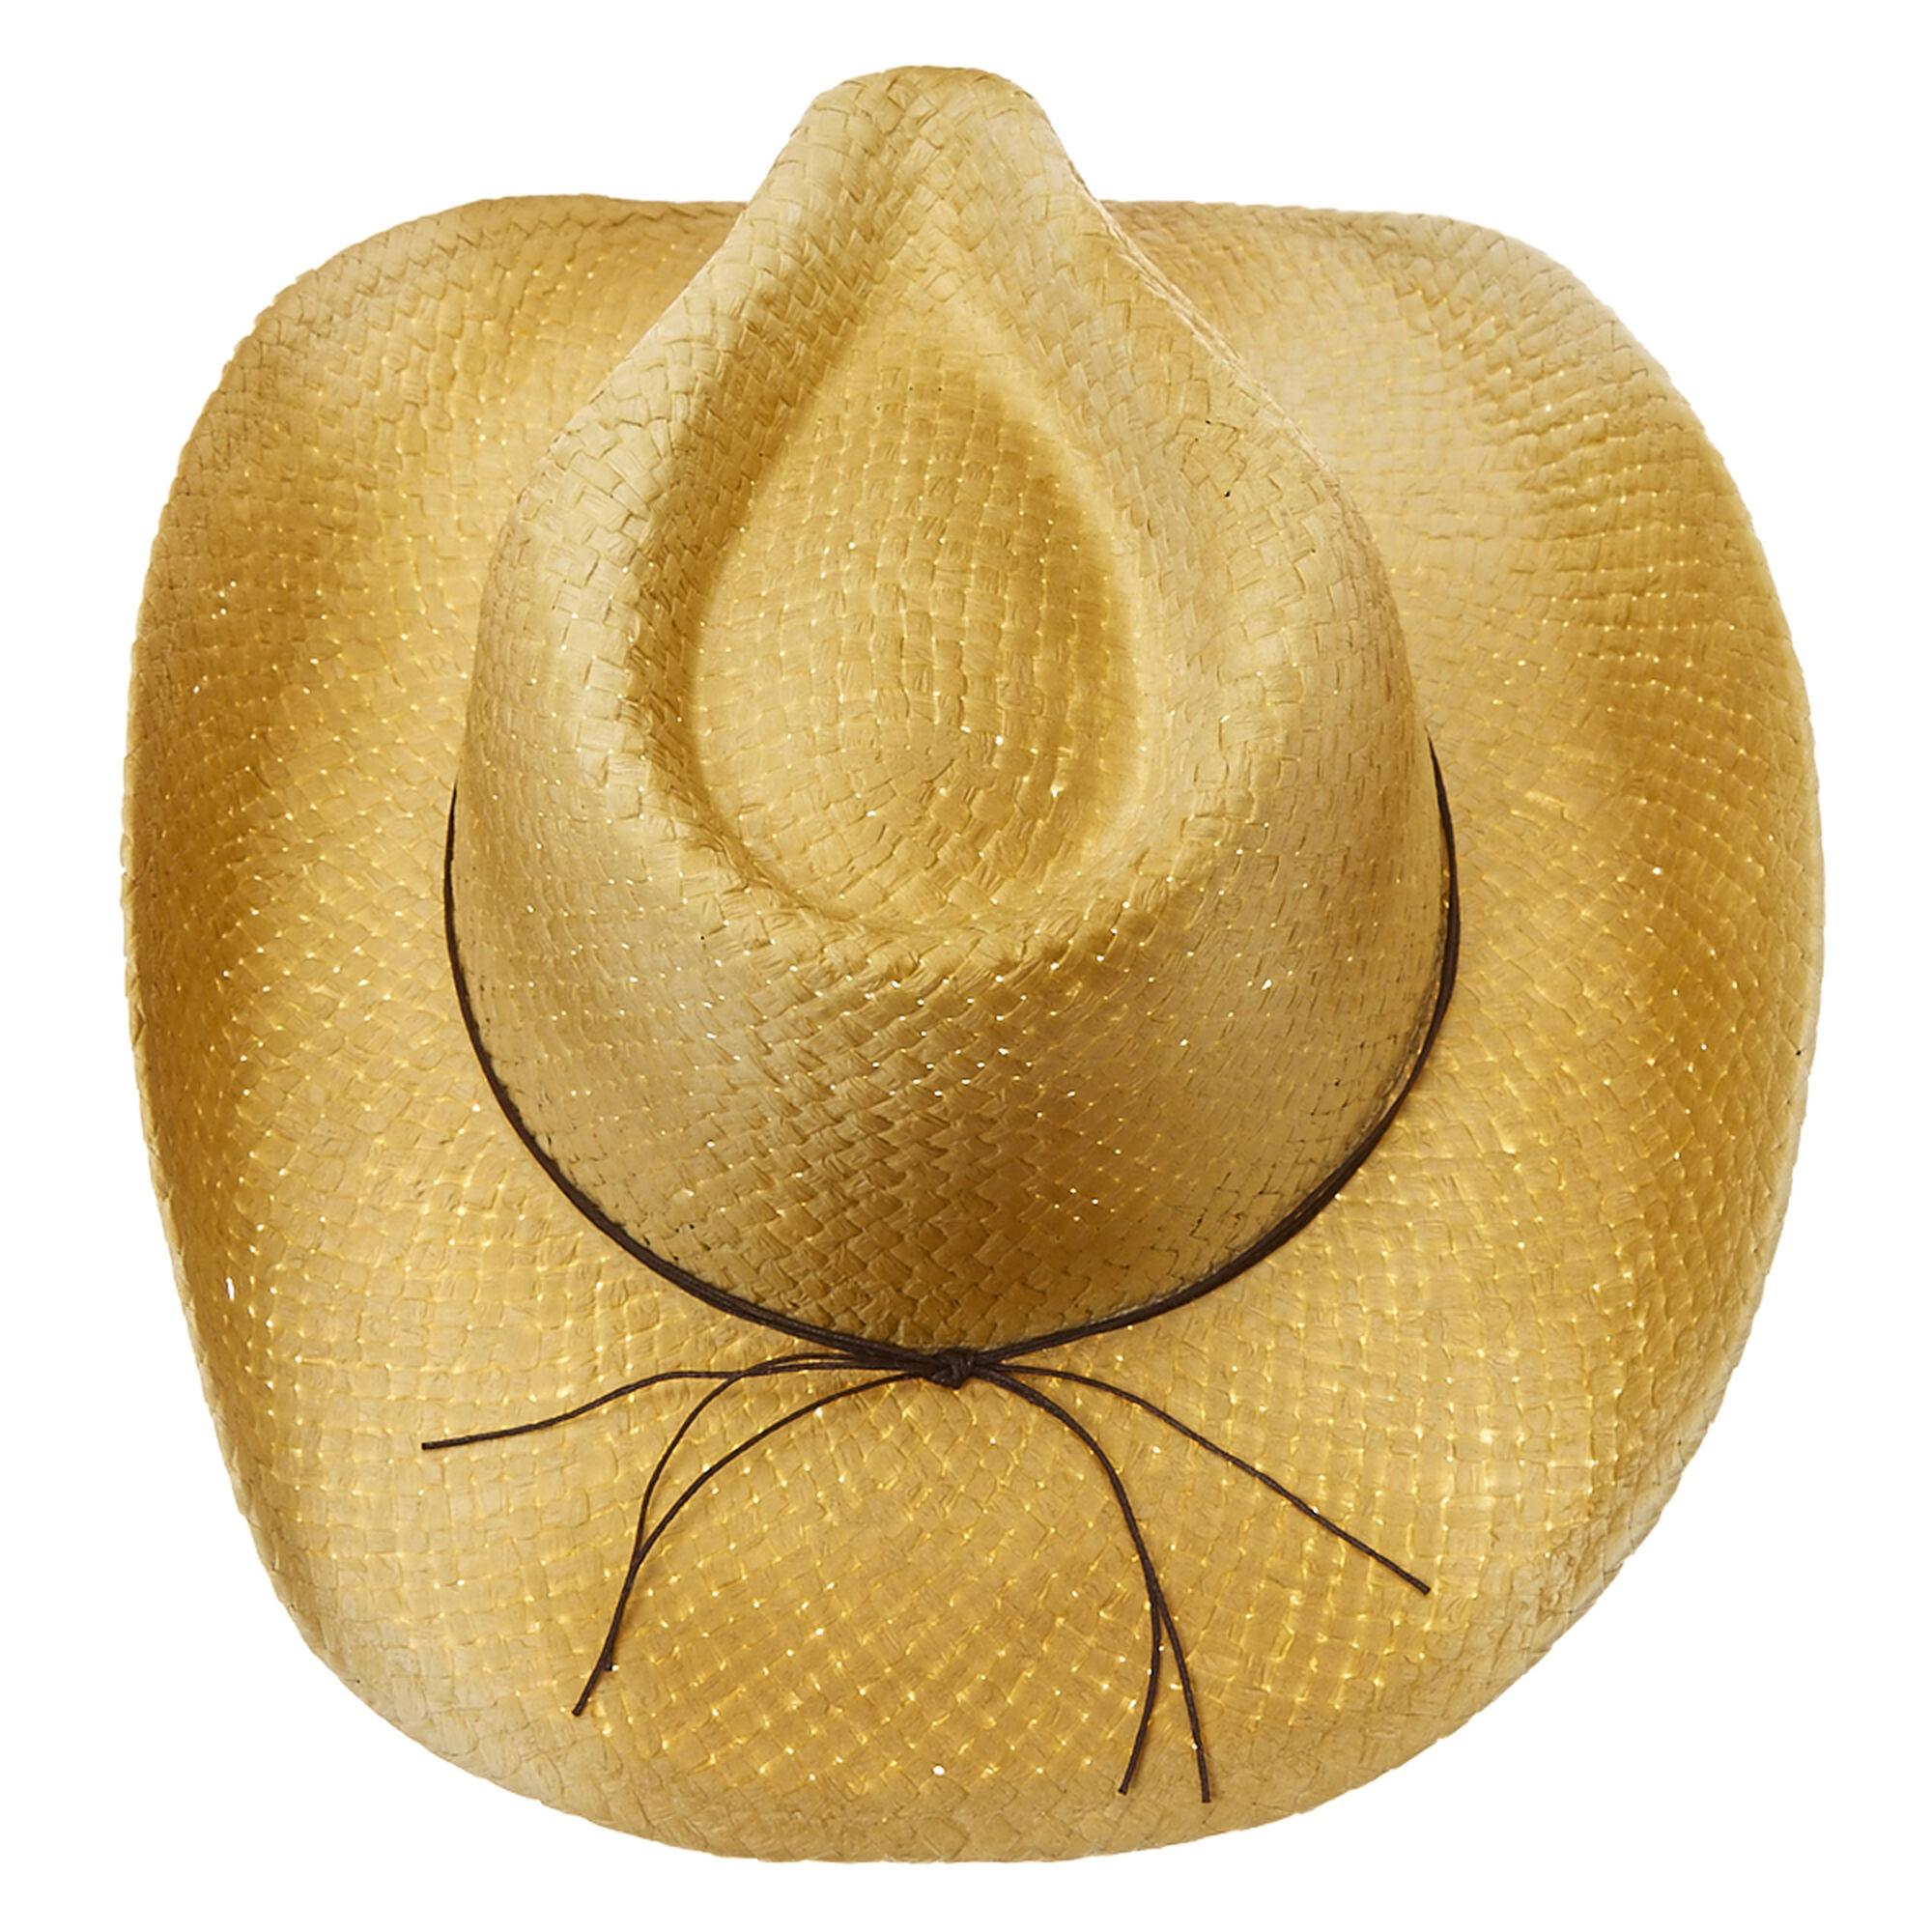 ec1033e8c06ef1 Turquoise Stone Bead Straw Cowboy Hat | Icing US